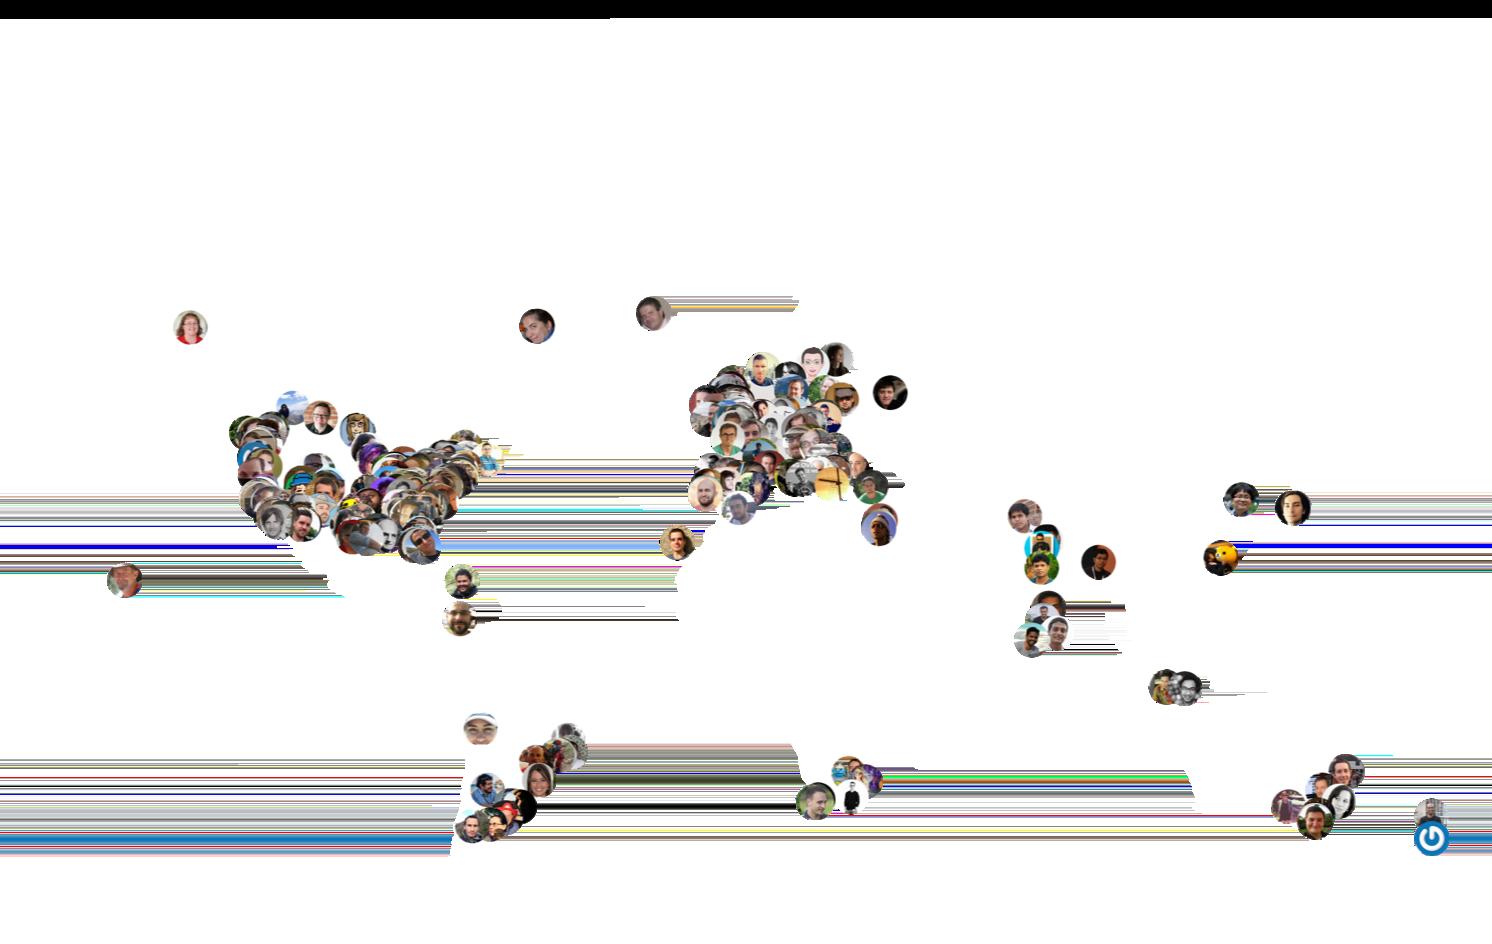 Automattic locations worldwide